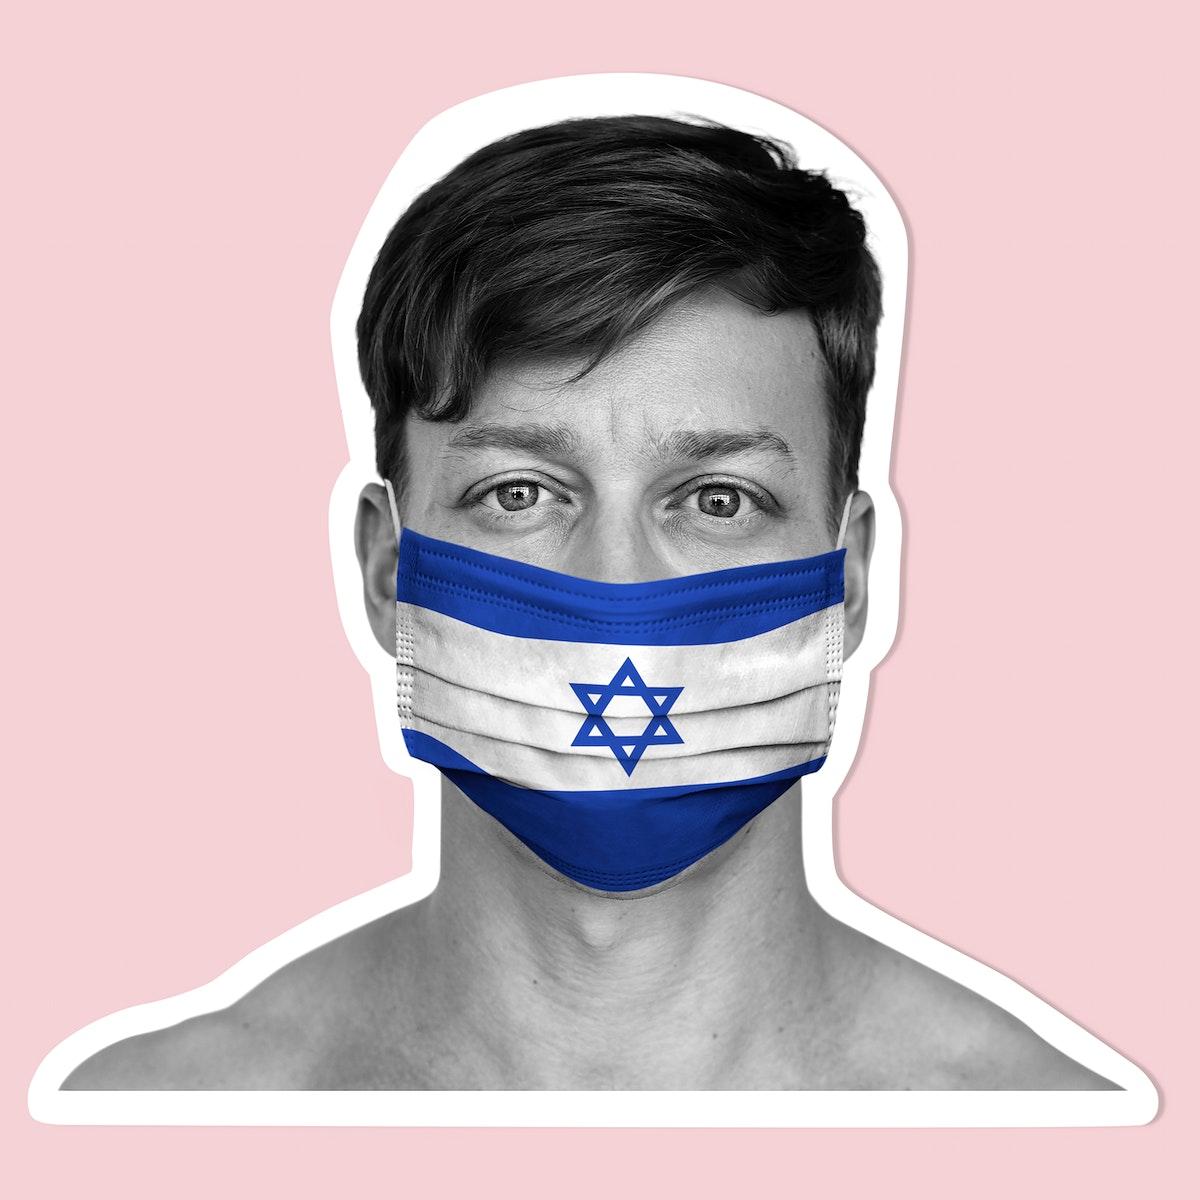 Israeli wearing a face mask during coronavirus pandemic